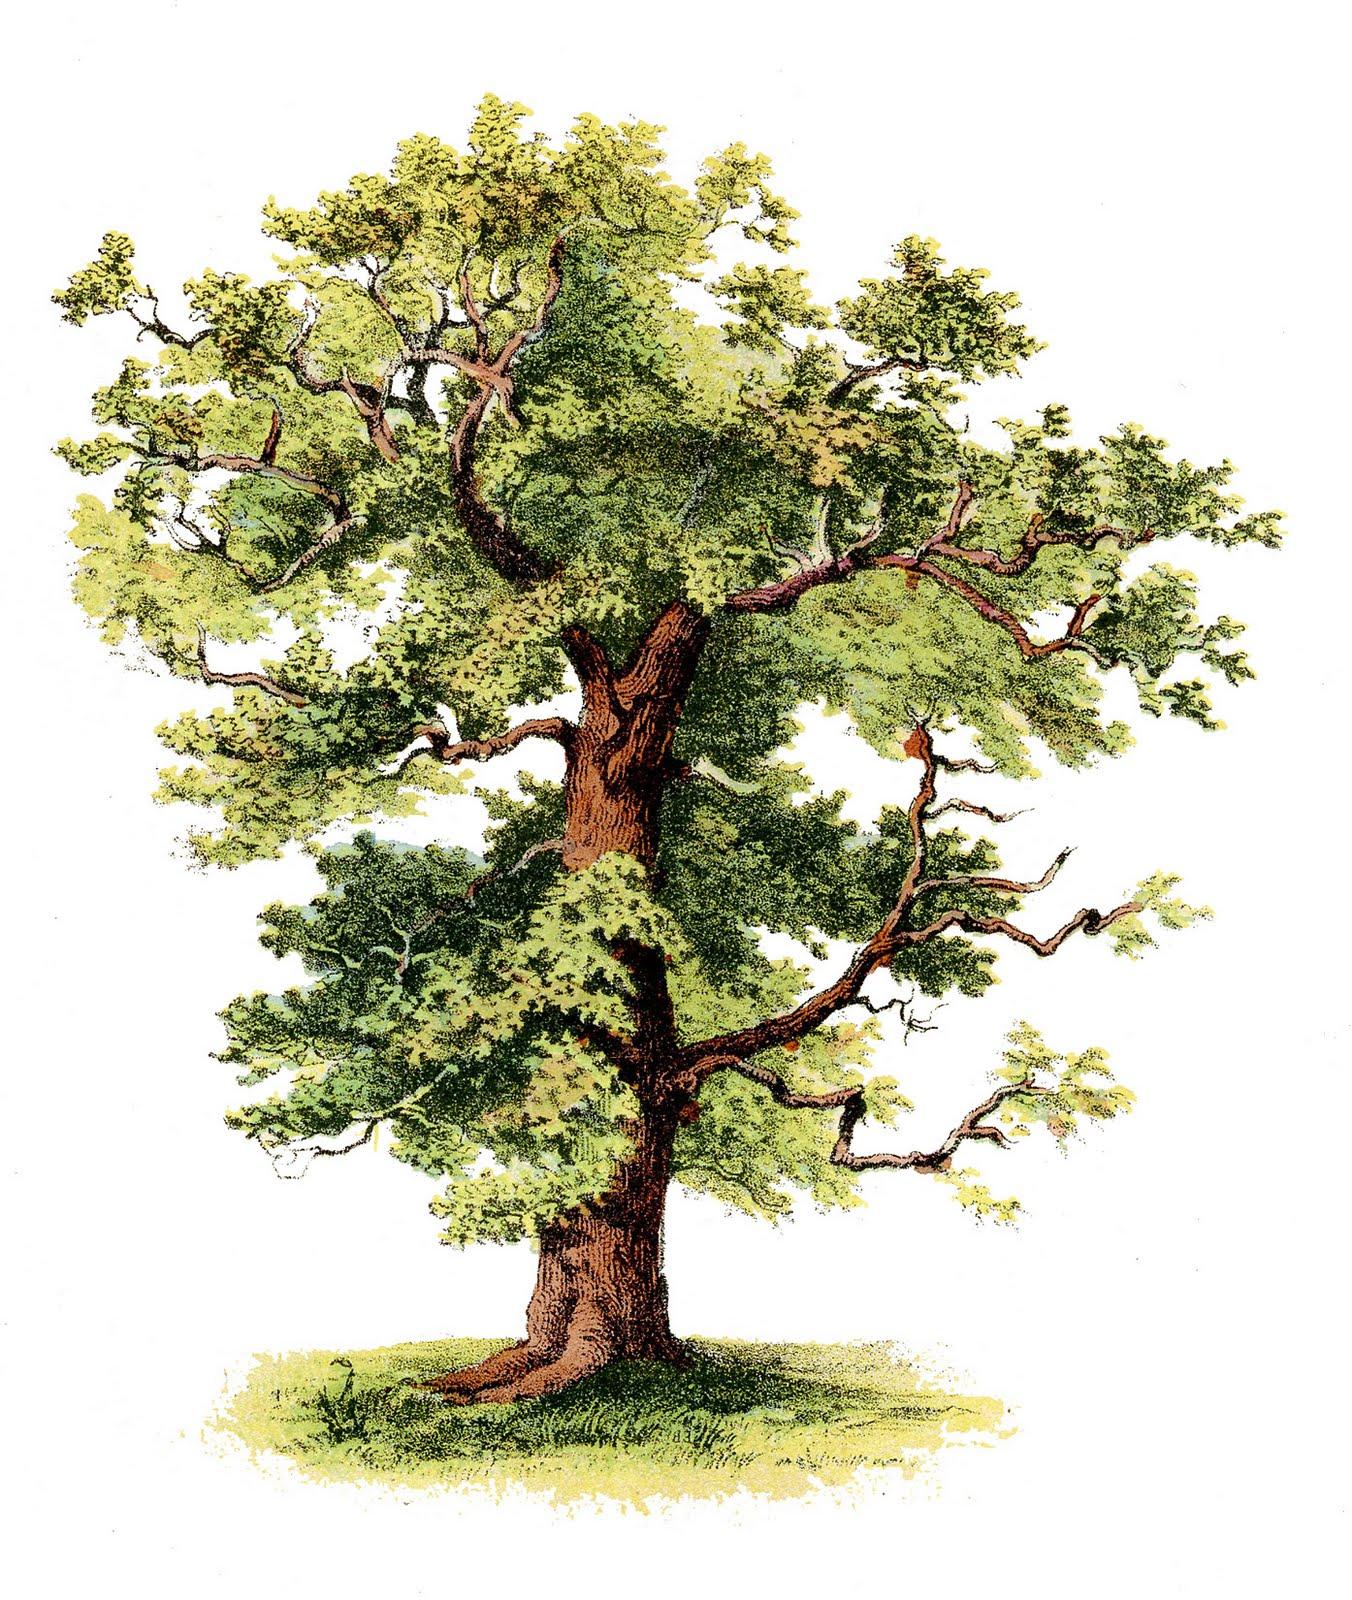 Antique Clip Art Beautiful Tree The Grap-Antique Clip Art Beautiful Tree The Graphics Fairy-3